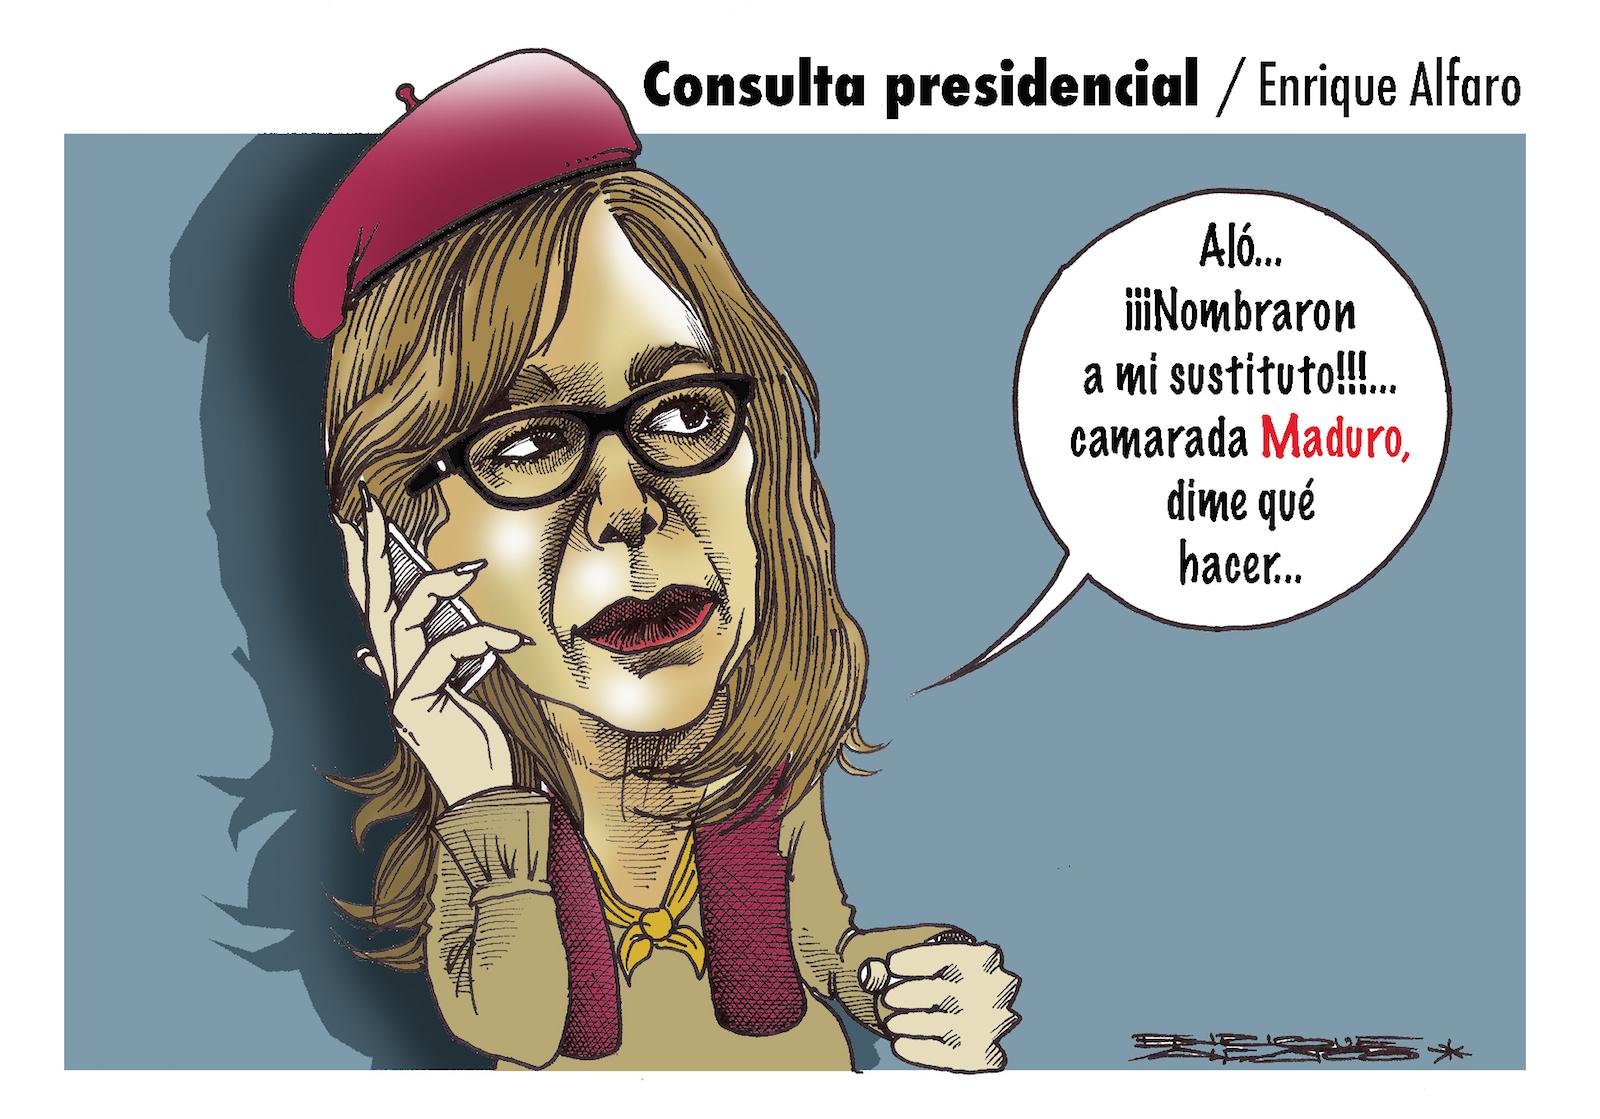 Consulta presidencial / Enrique Alfaro